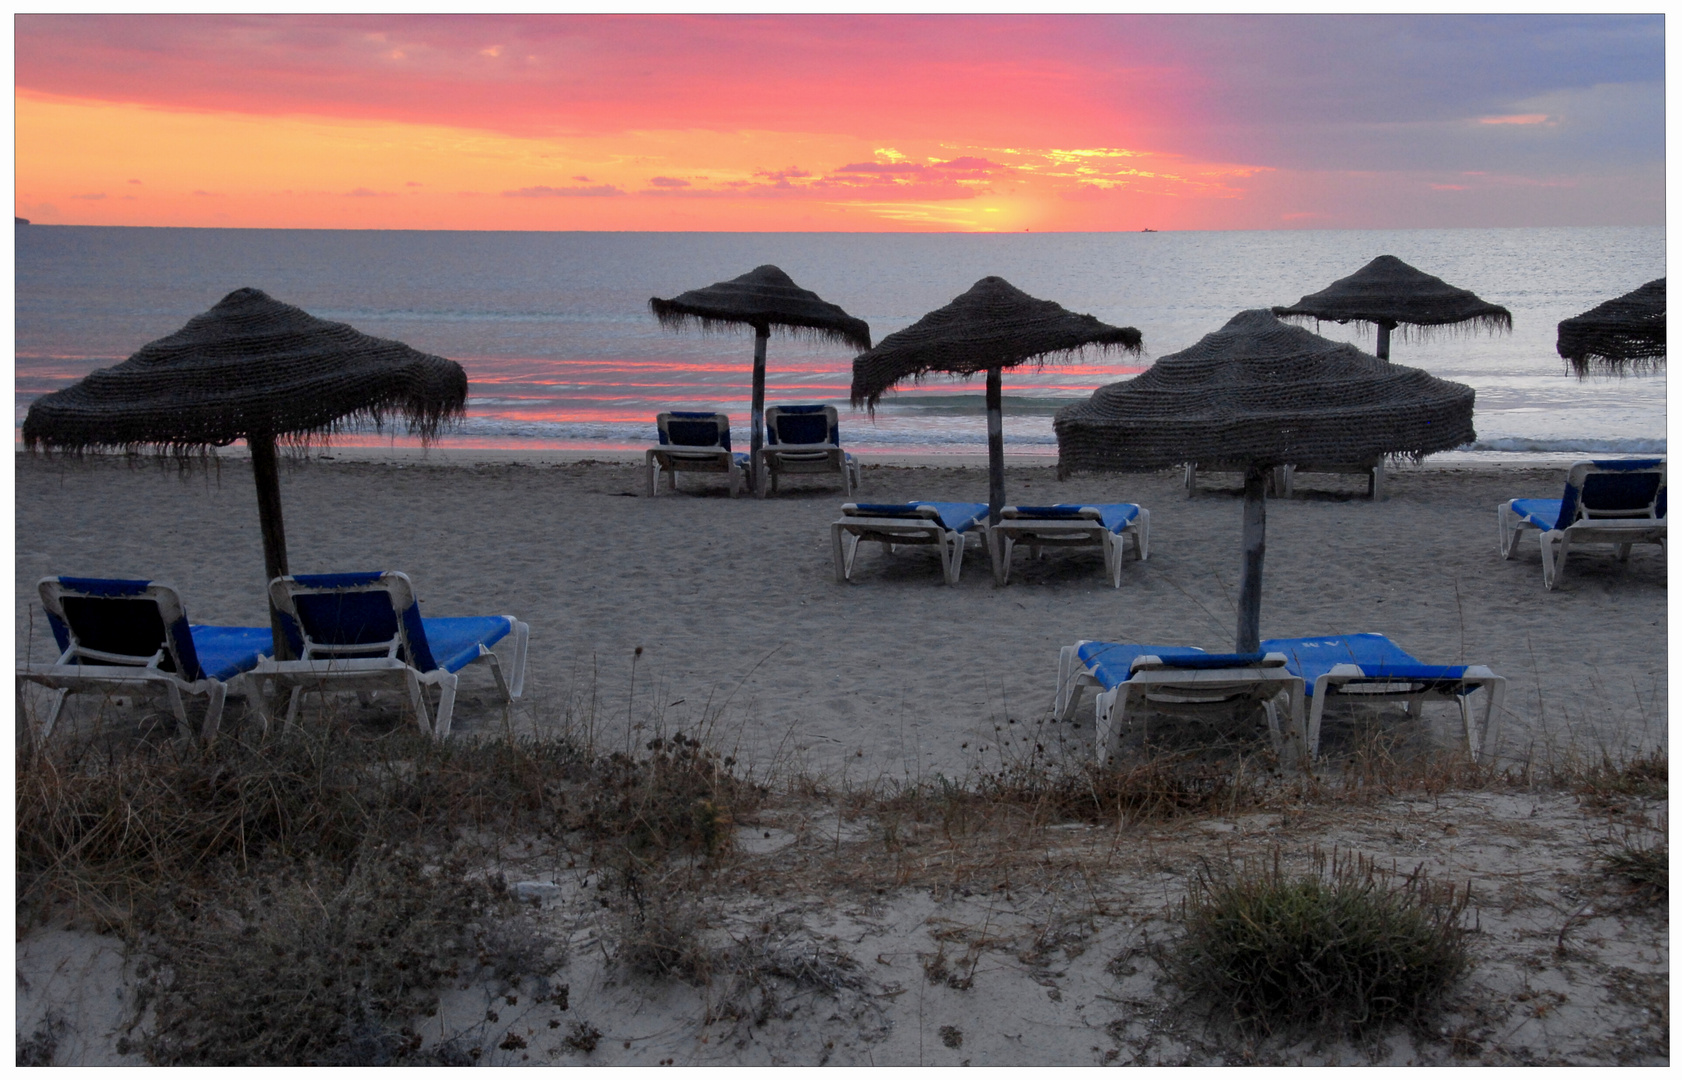 Mallorca, Playa de Muro, salida de sol (Sonnenaufgang)